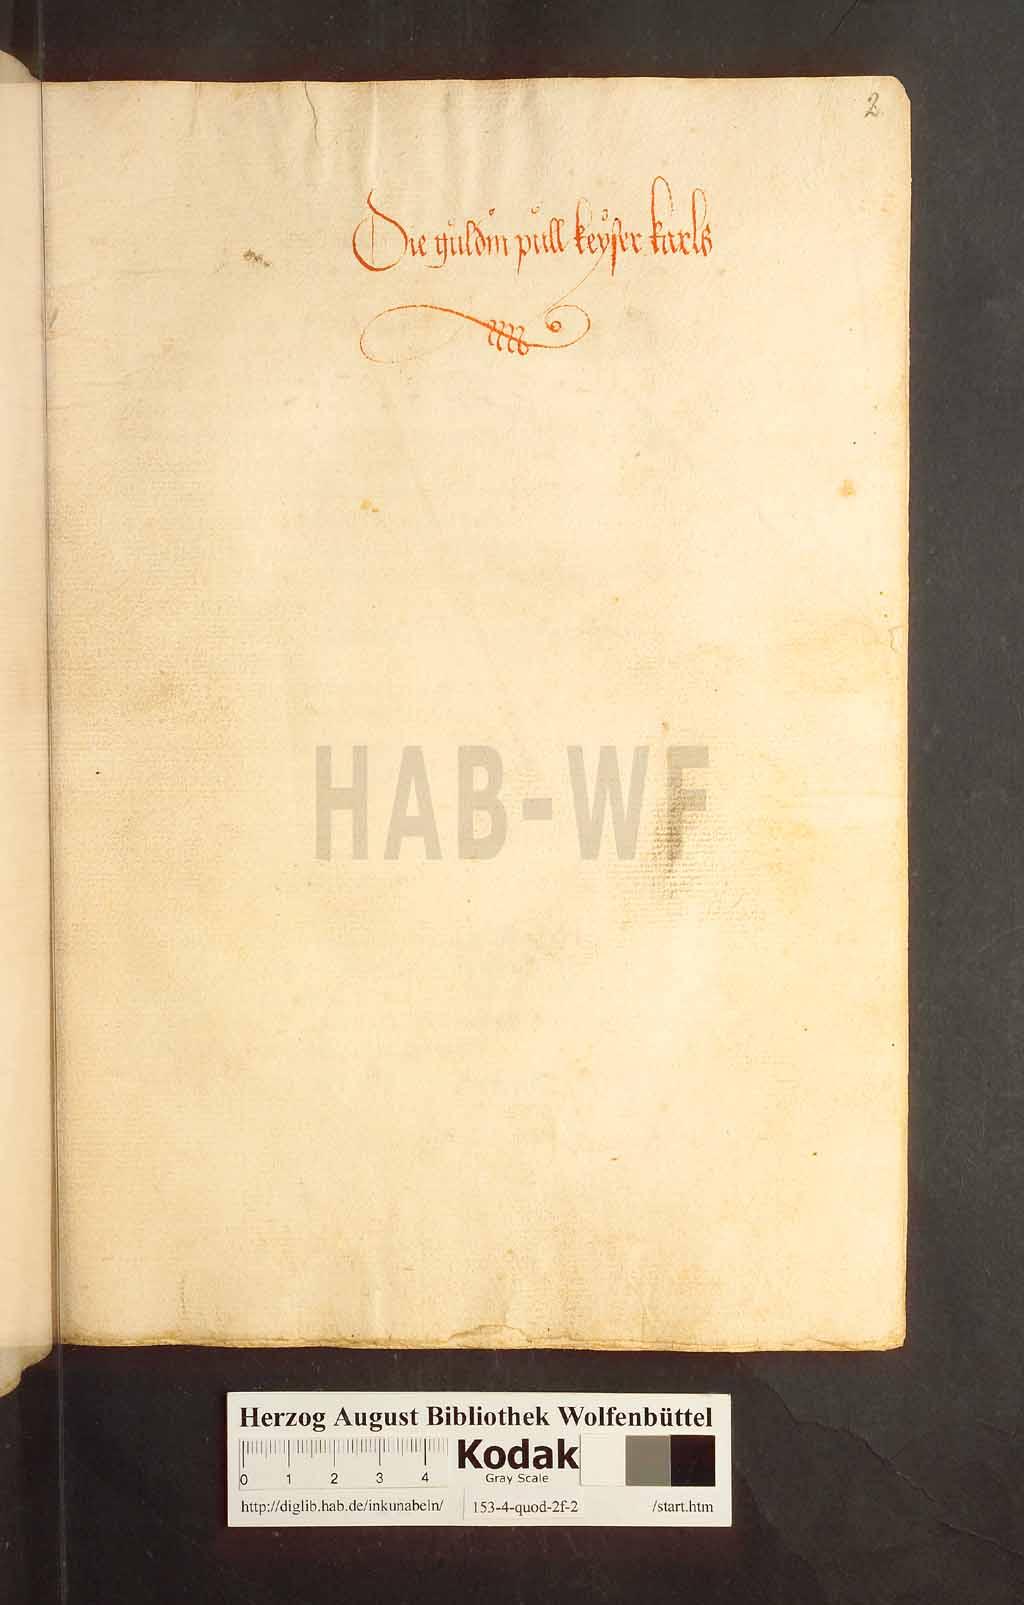 http://diglib.hab.de/inkunabeln/153-4-quod-2f-2/00001.jpg